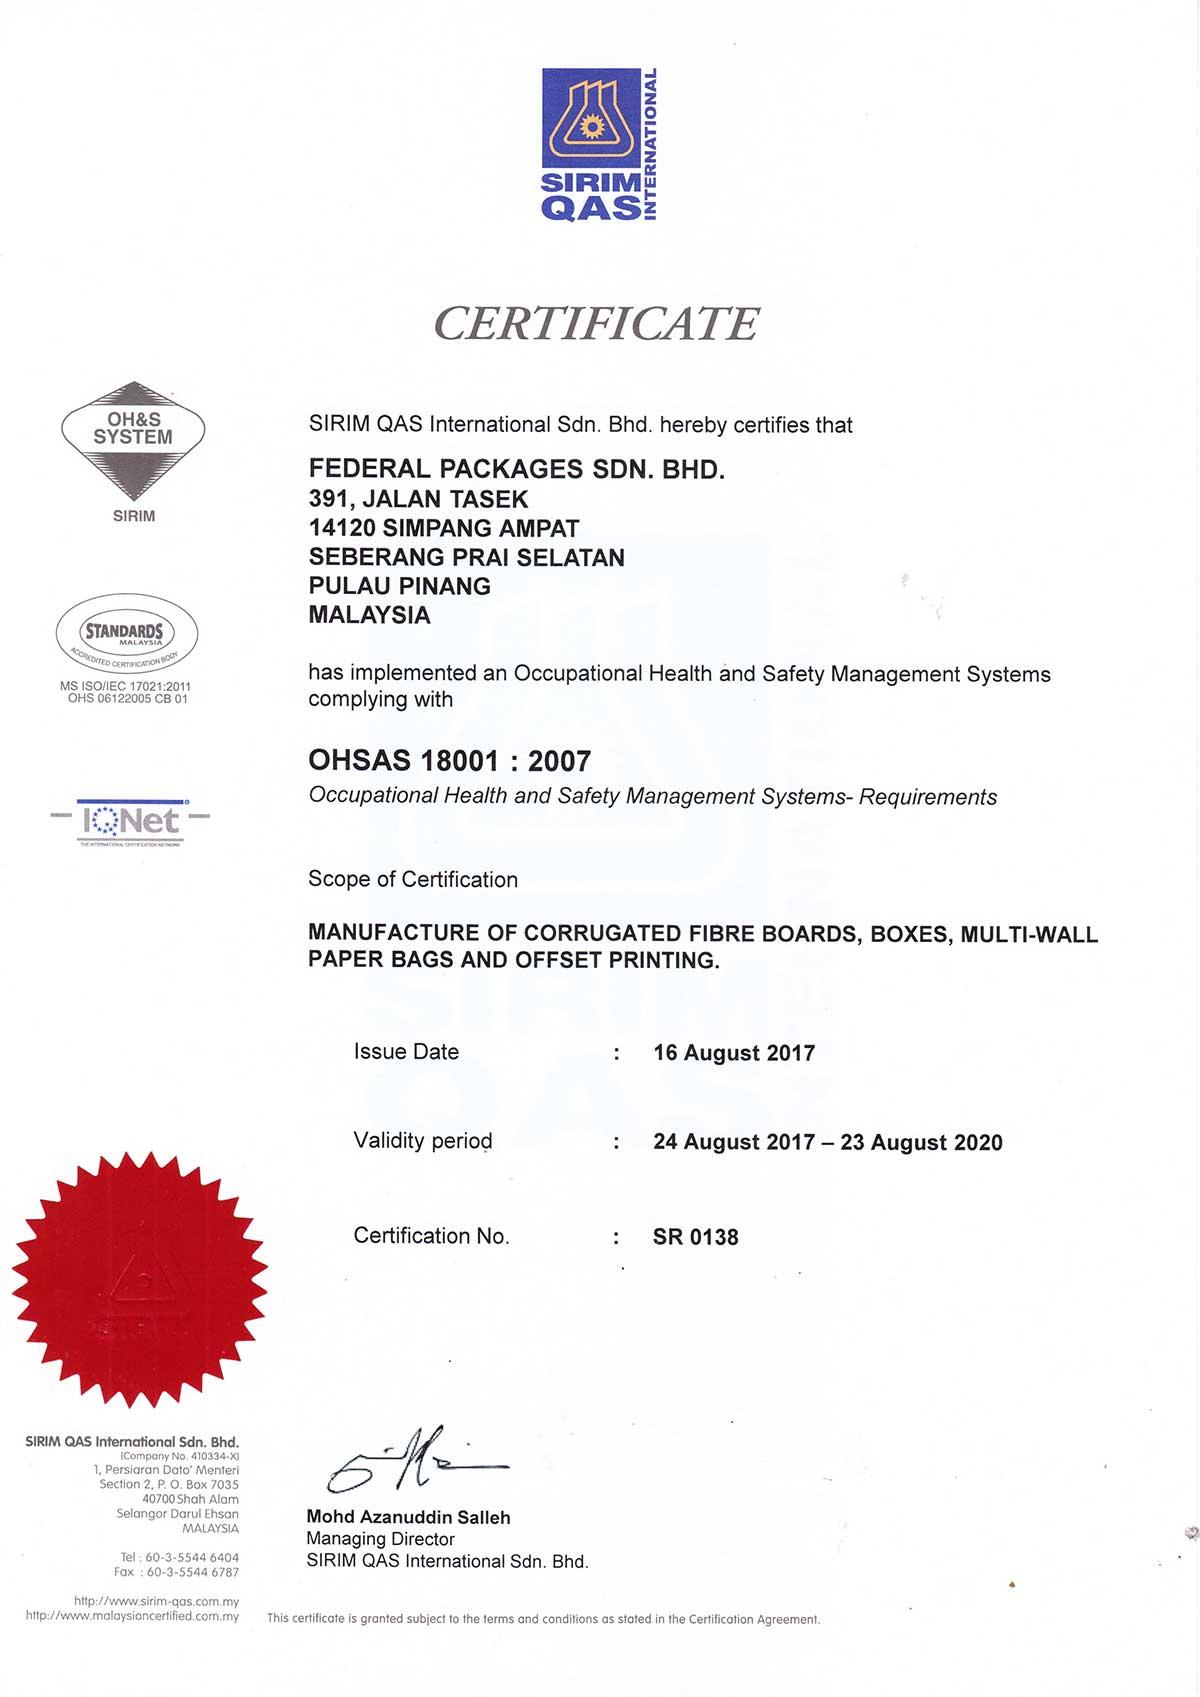 OHSAS 18001-2007-Federal-Packaging-Sdn-Bhd